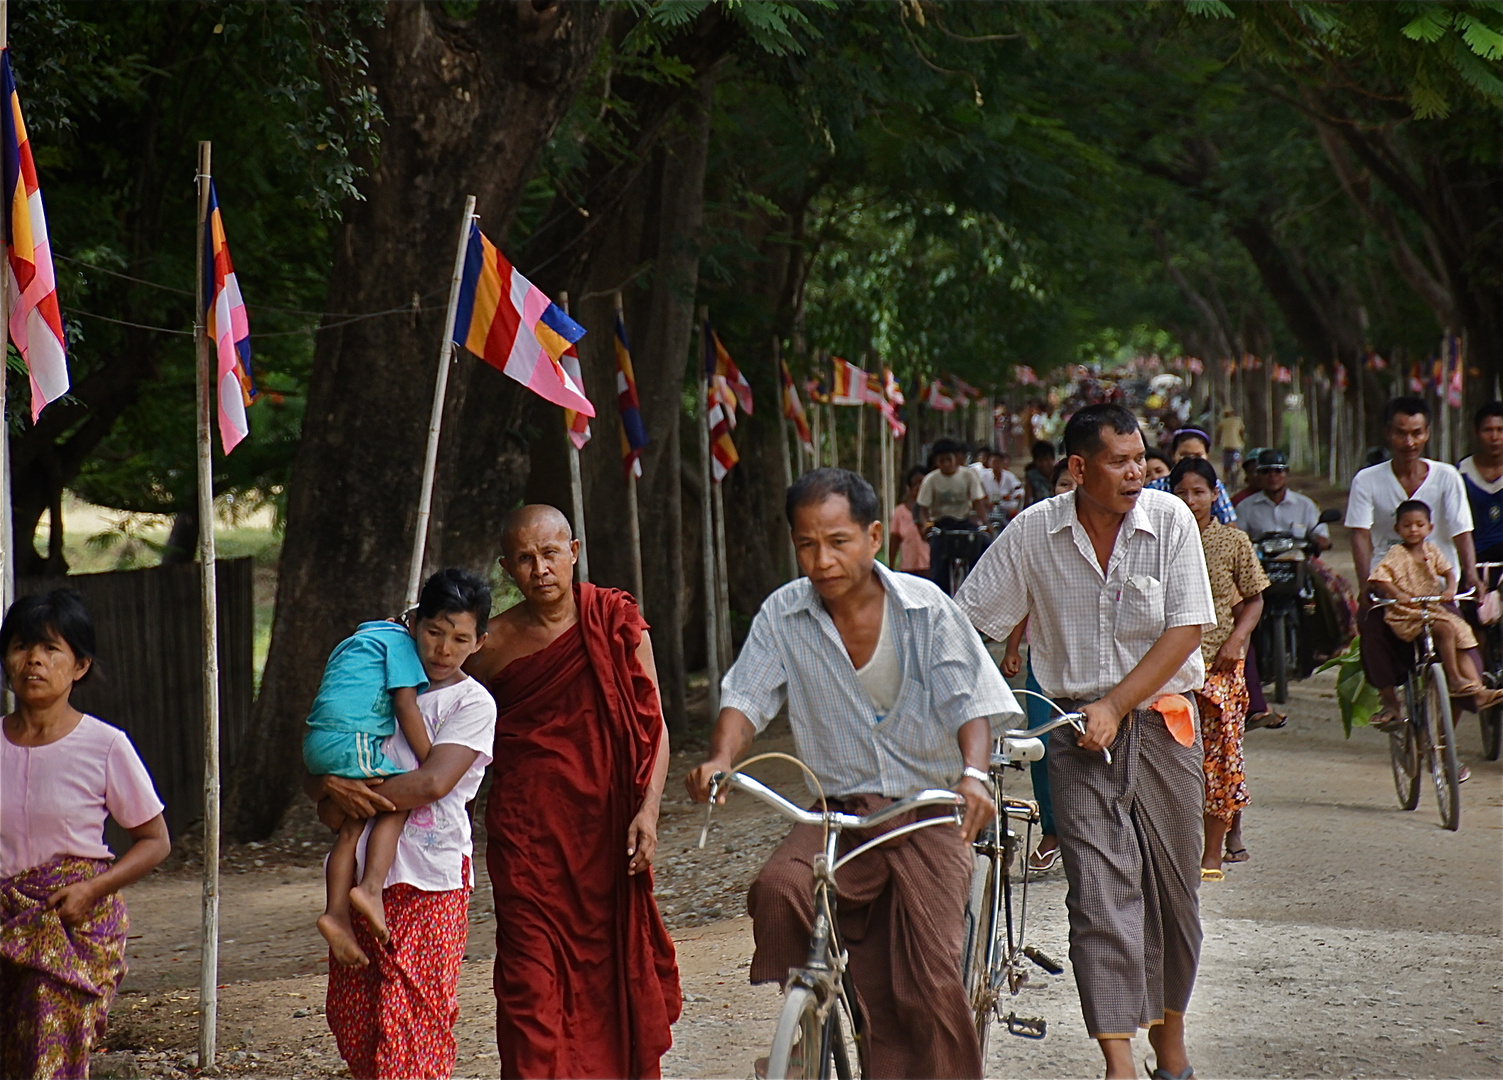 auf zum tempelfest, bezirk mandalay, burma 2011